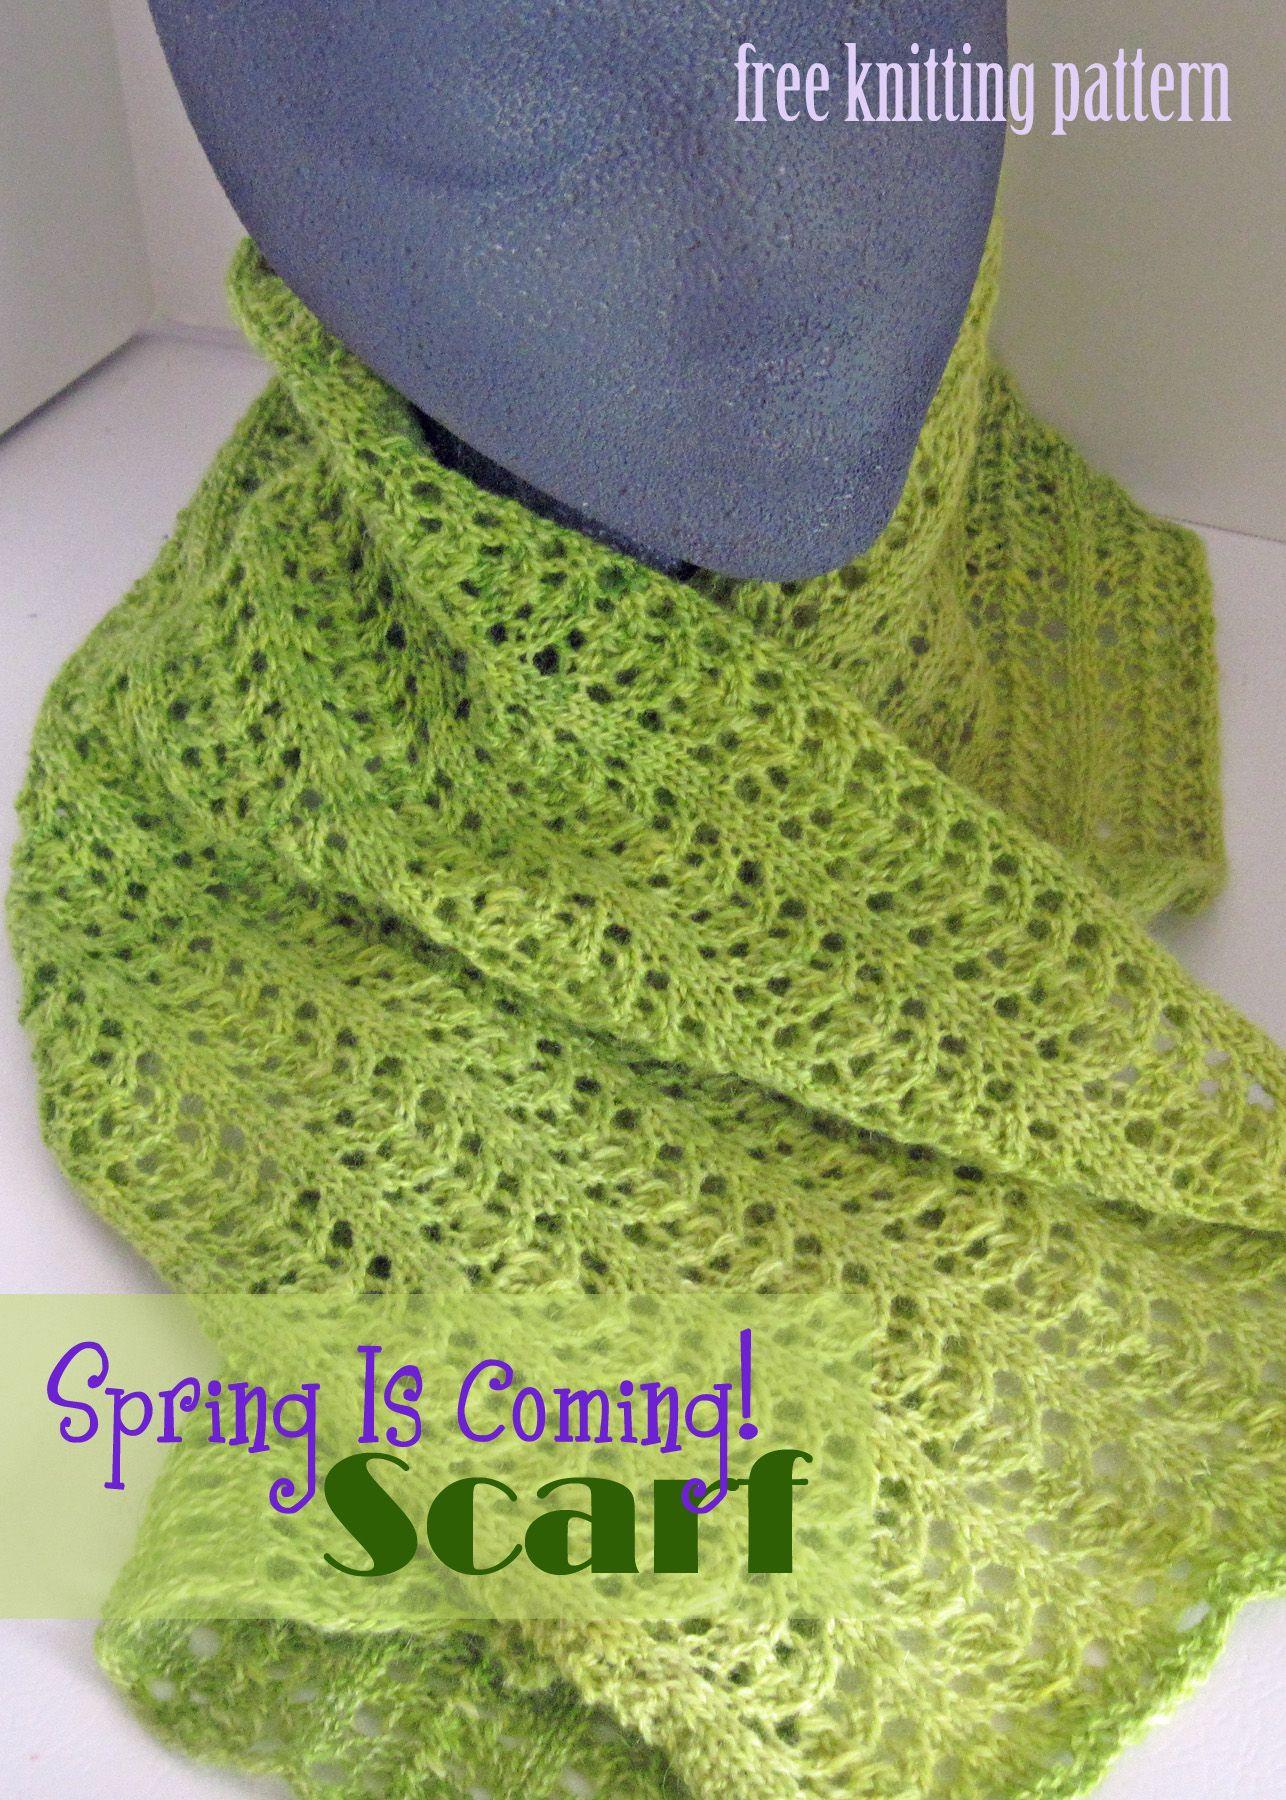 Free knitting pattern spring lace scarf craftown knit and free knitting pattern spring lace scarf craftown bankloansurffo Choice Image